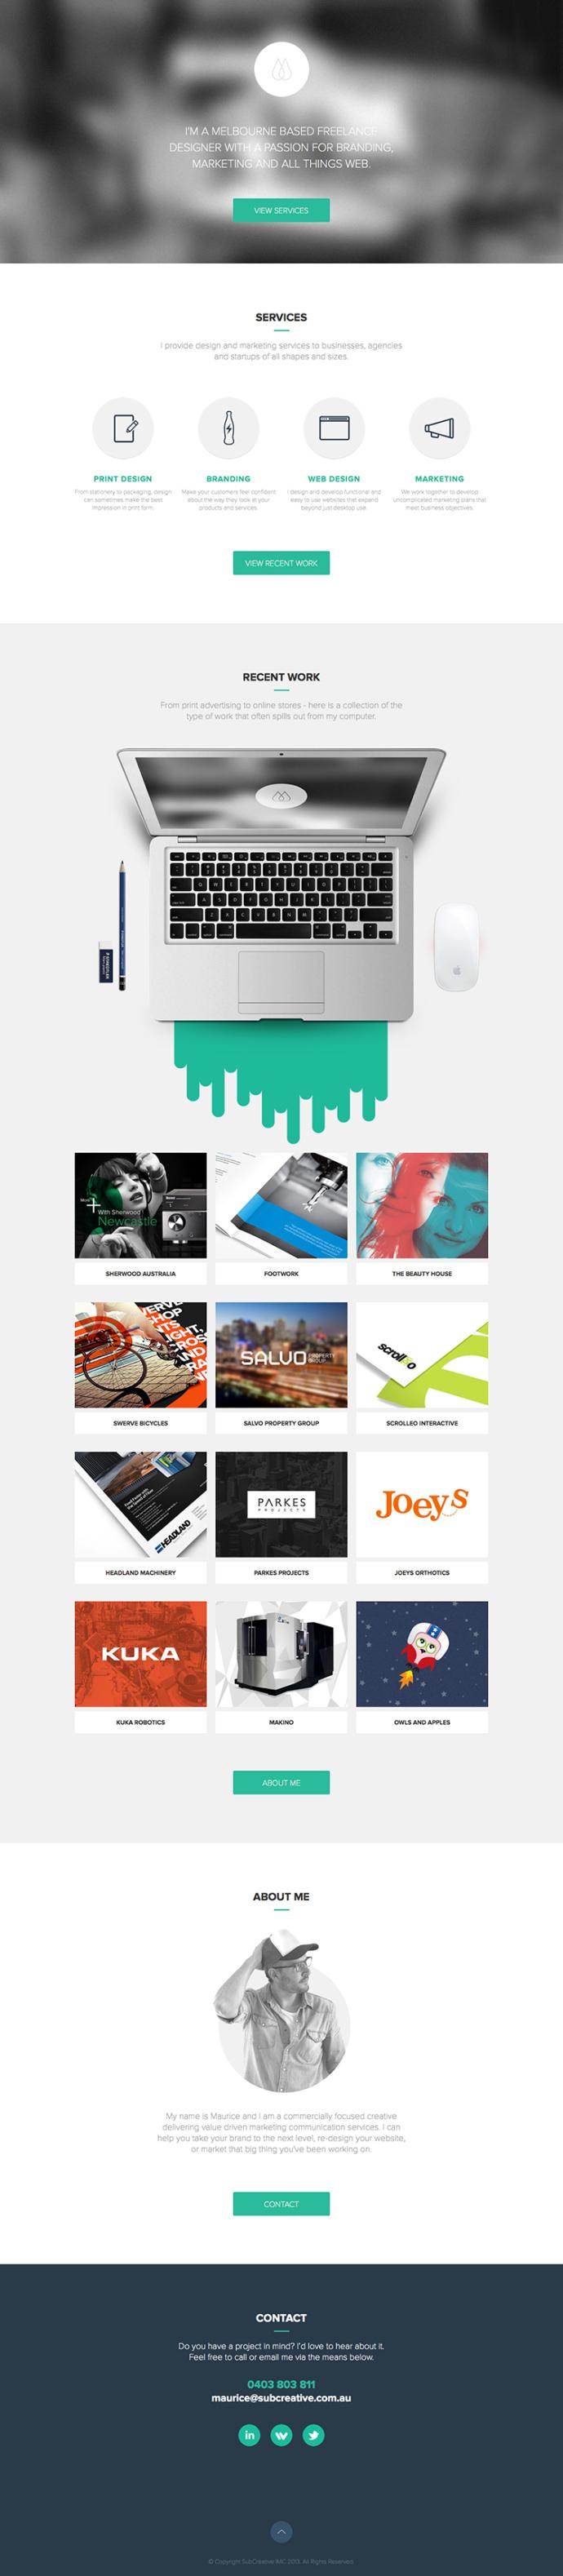 Sub Creative Http Www Fltdsgn Com Web Development Design Web Design Web Design Trends